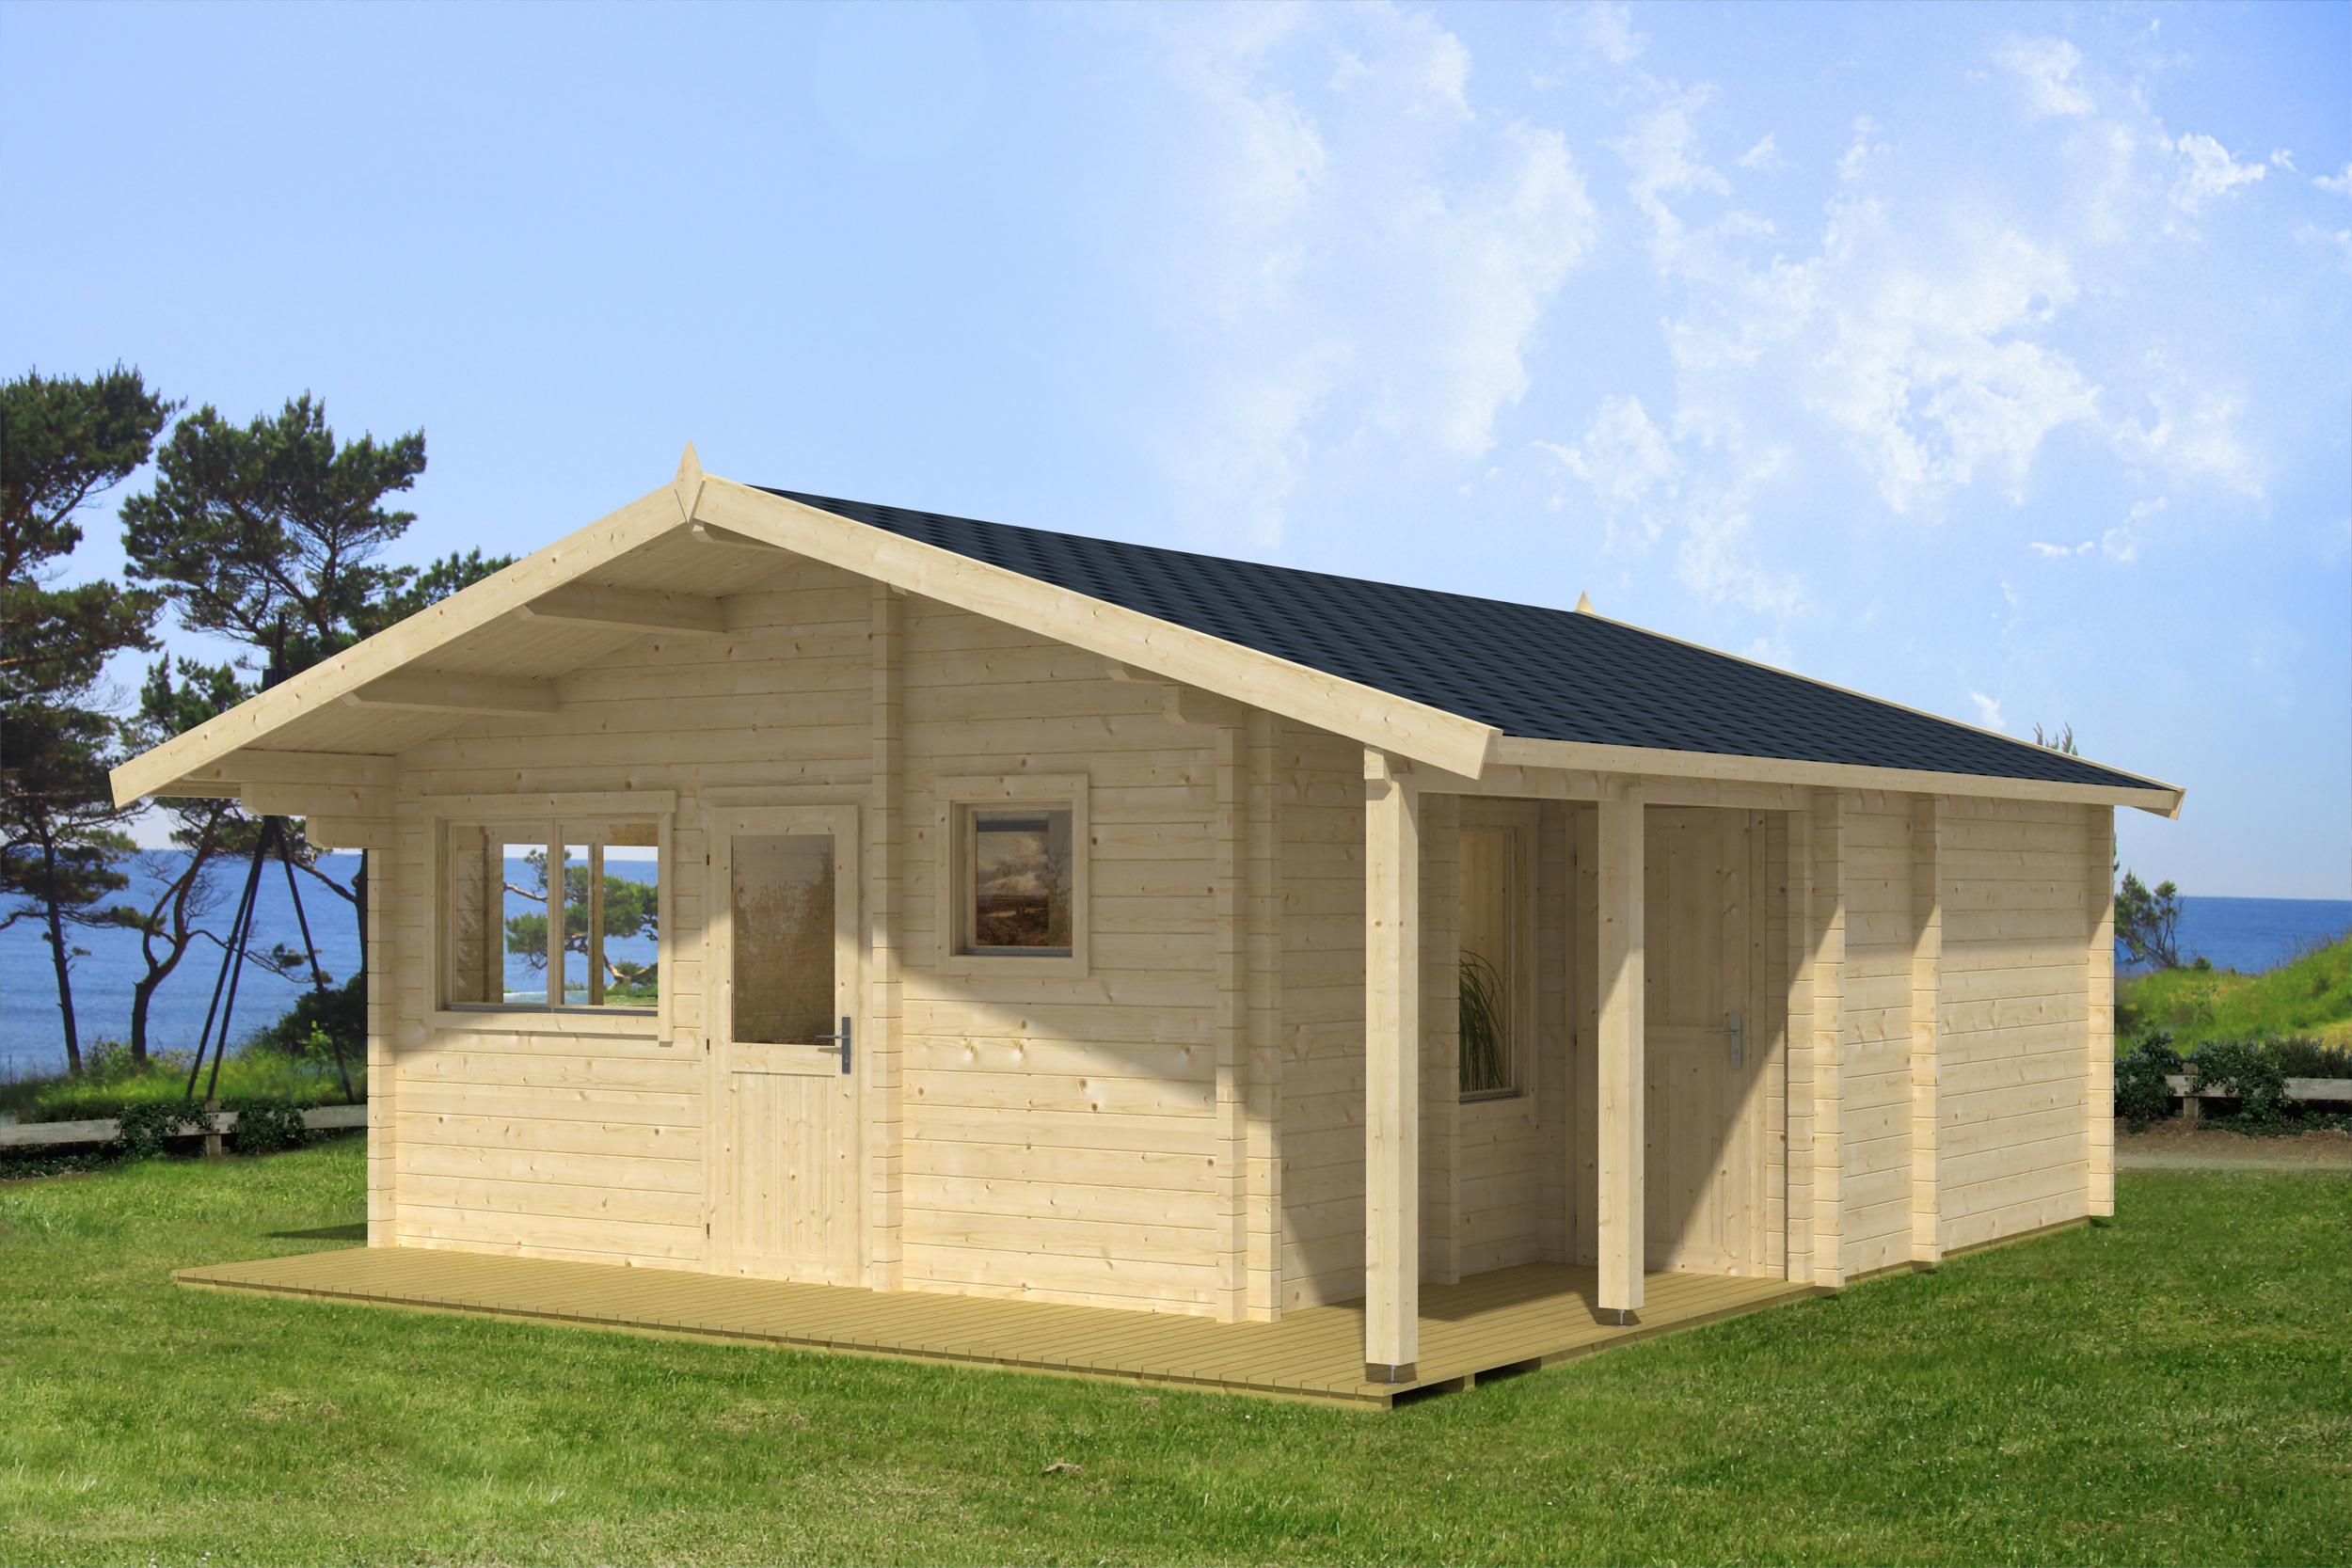 ferienhaus jordan 70 mm ca 595x595 cm holzwurm obersayn. Black Bedroom Furniture Sets. Home Design Ideas